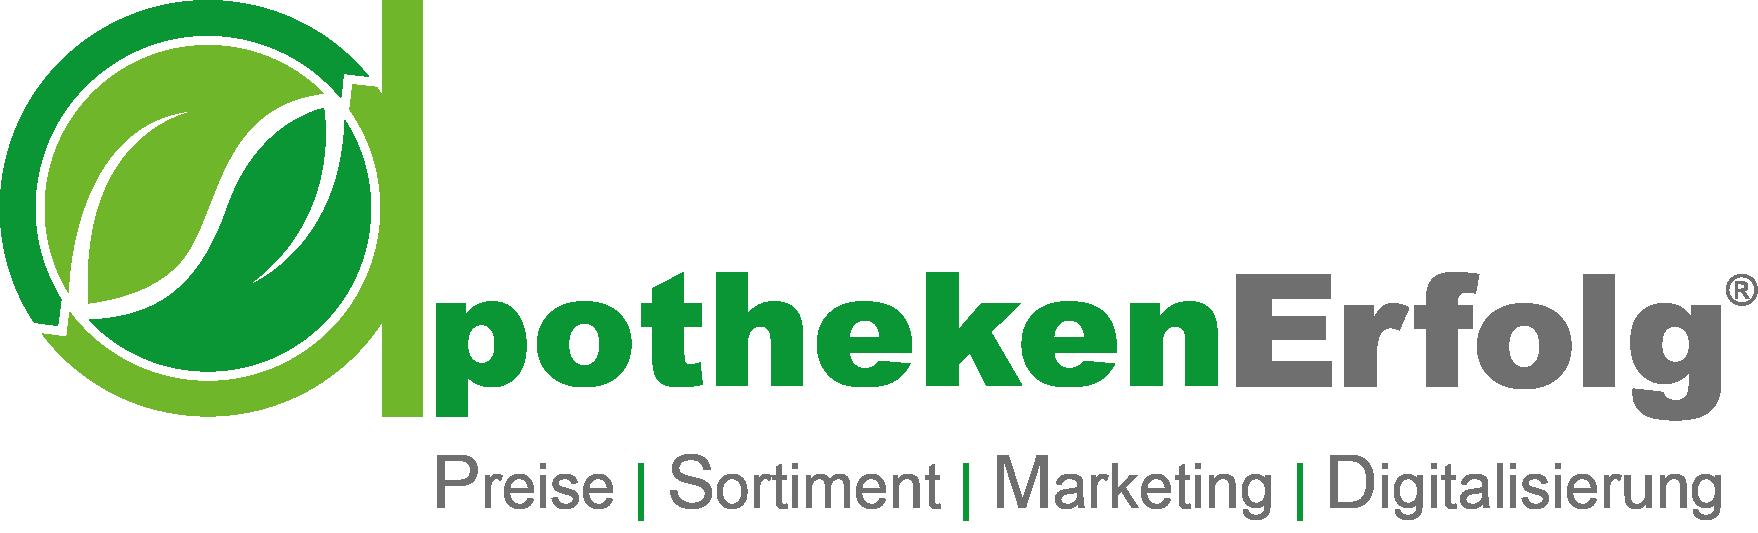 apothekenErfolg Logo - QUER (R) Slogan 1758x533